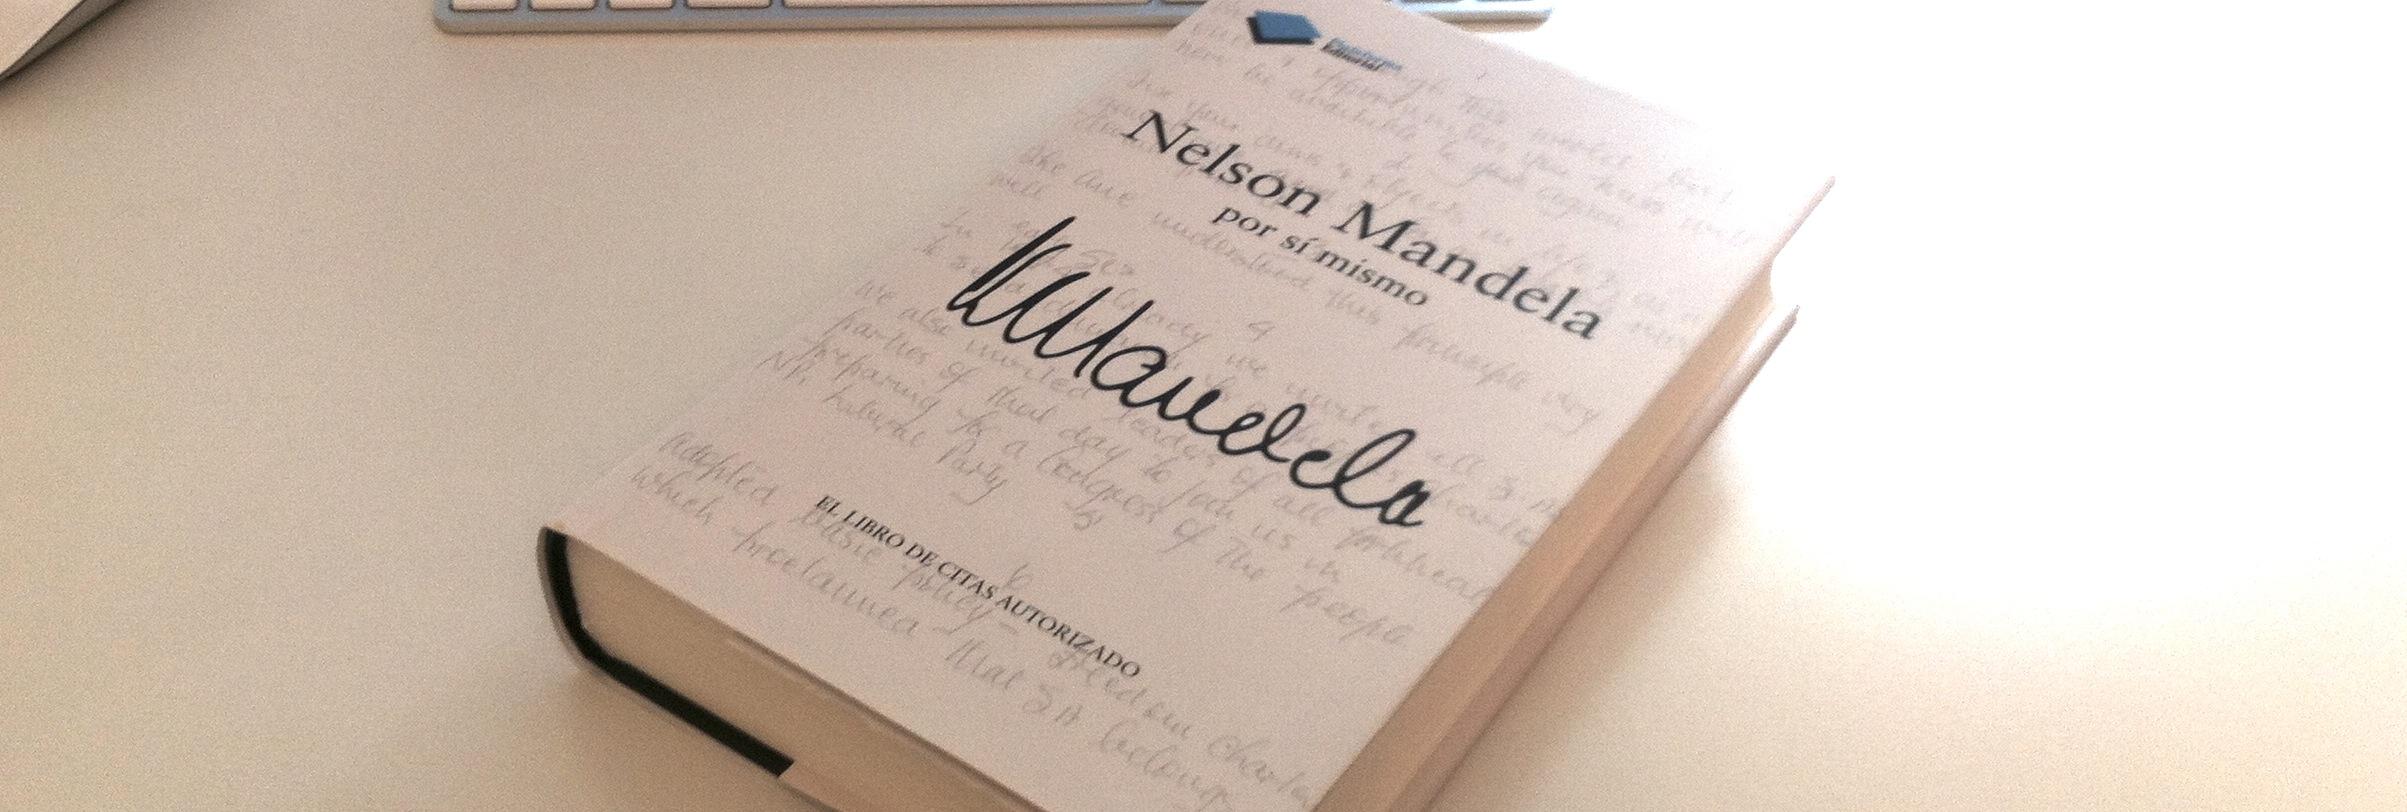 Libro Nelson Mandela